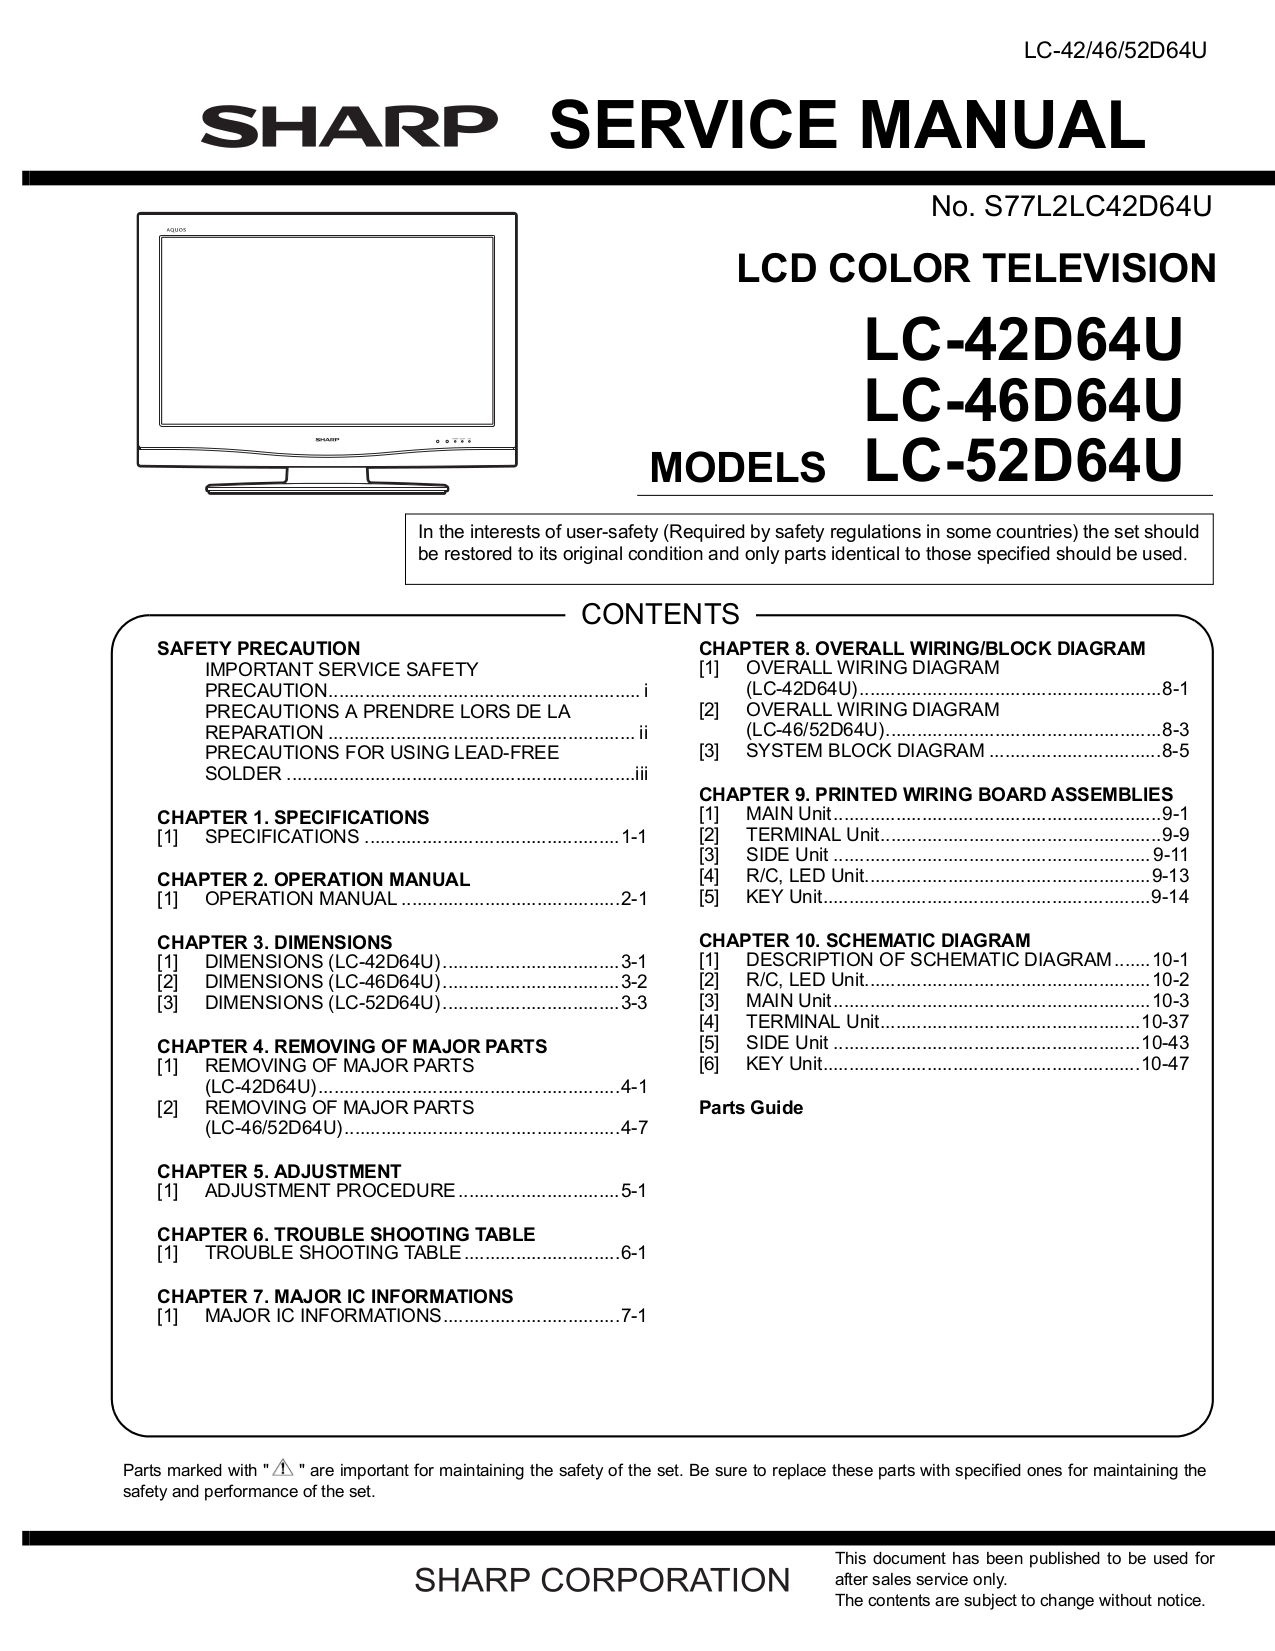 download free pdf for sharp aquos lc 52d64u tv manual rh umlib com No Power On Sharp LC-52D64U sharp aquos lc 52d64u service manual